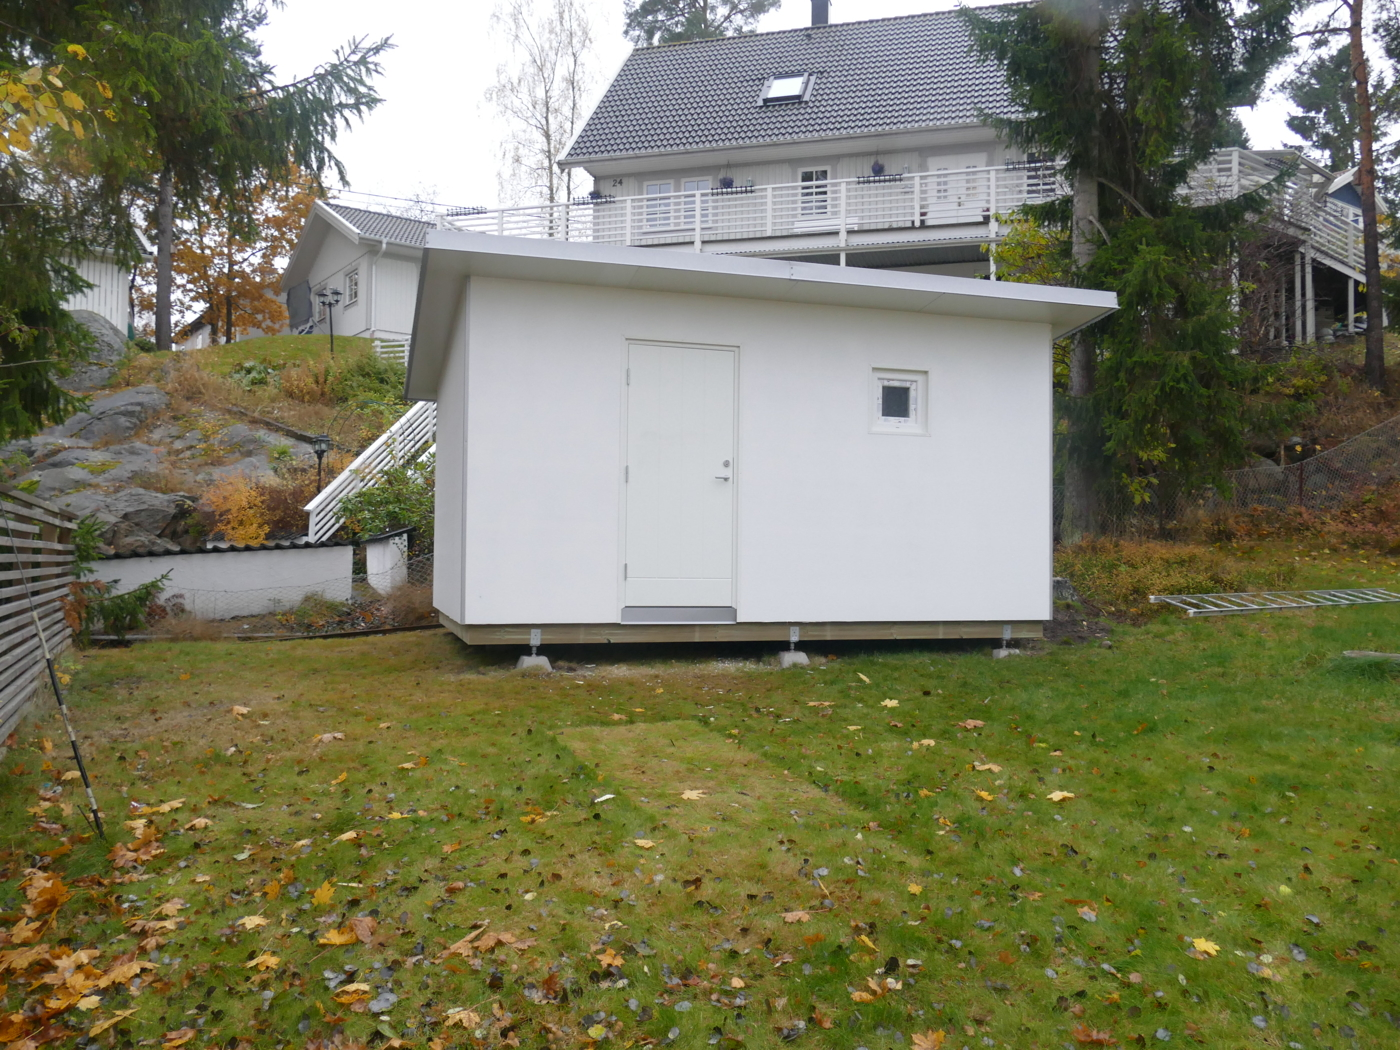 15 kvadrat | easy-house